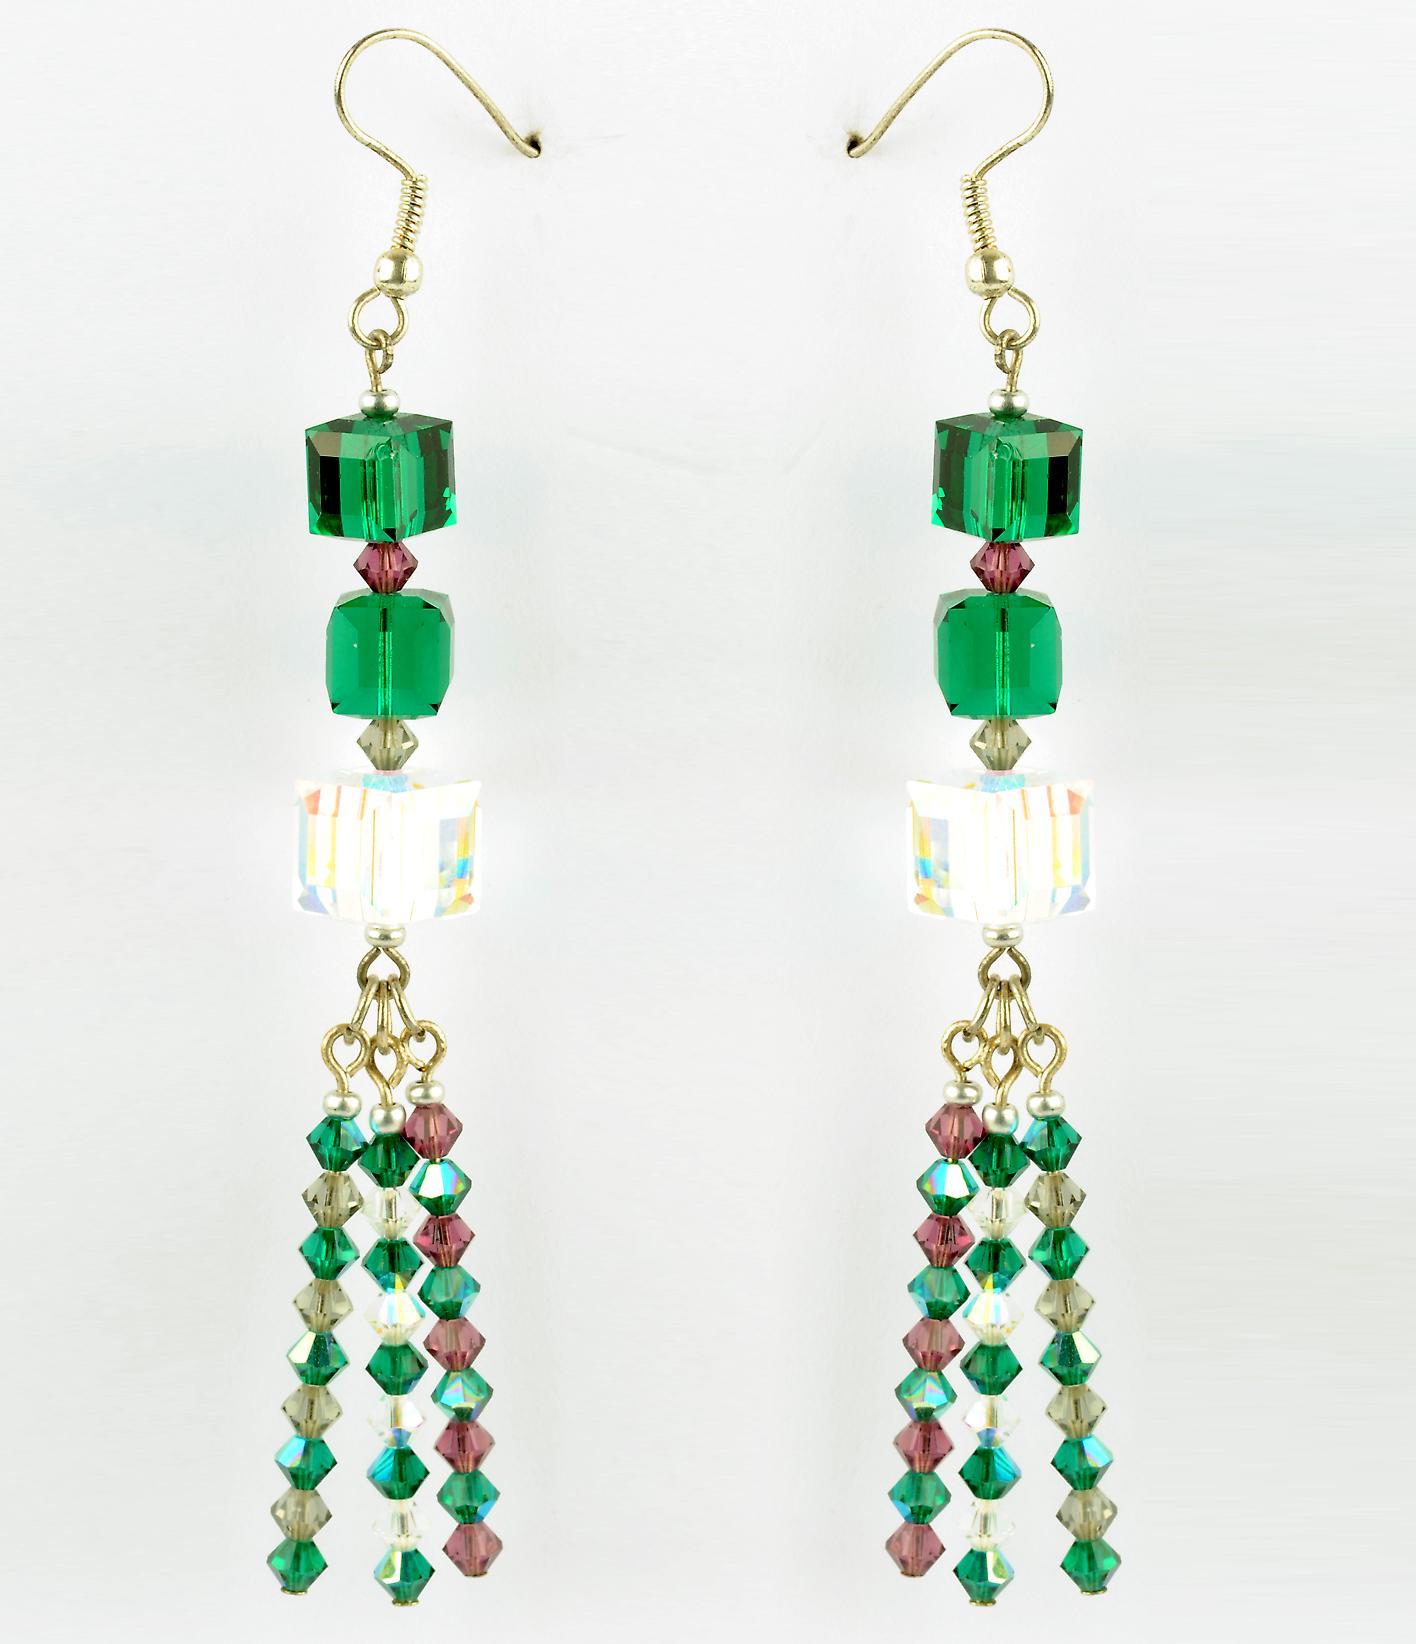 Waooh - joyas - WJ0779 - pendientes con diamantes de imitación Swarovski verde blanco púrpura - Monte Plata